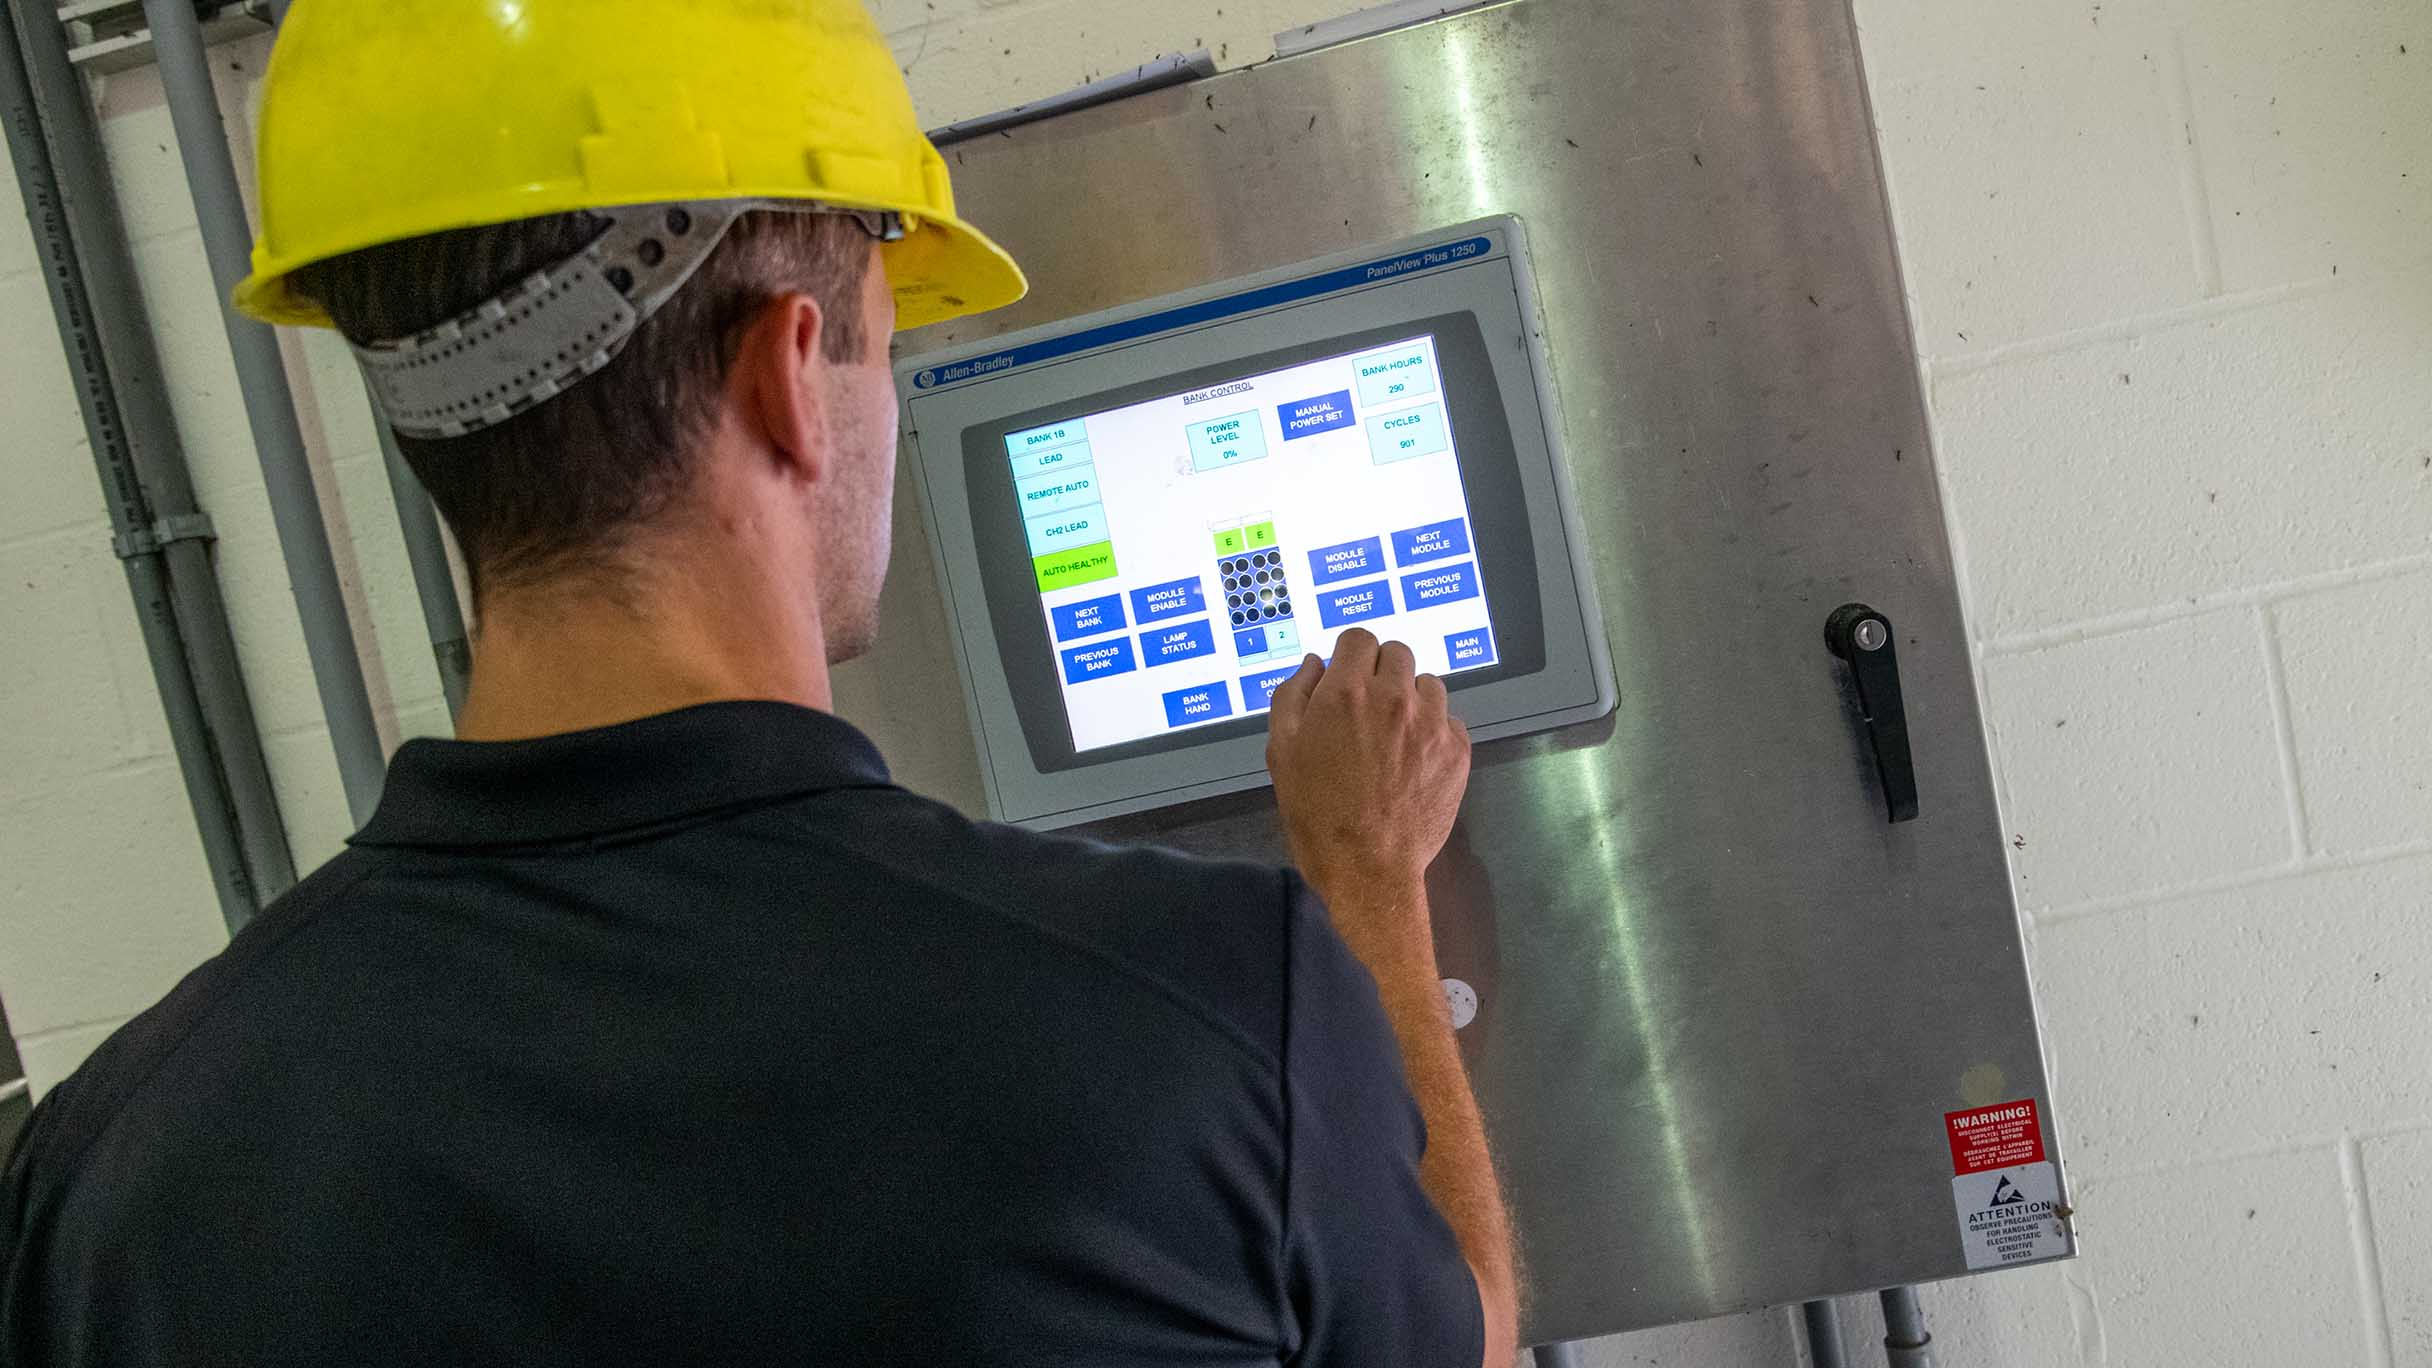 Bloomington-Normal wastewater treatment plant | GE Digital SCADA customer